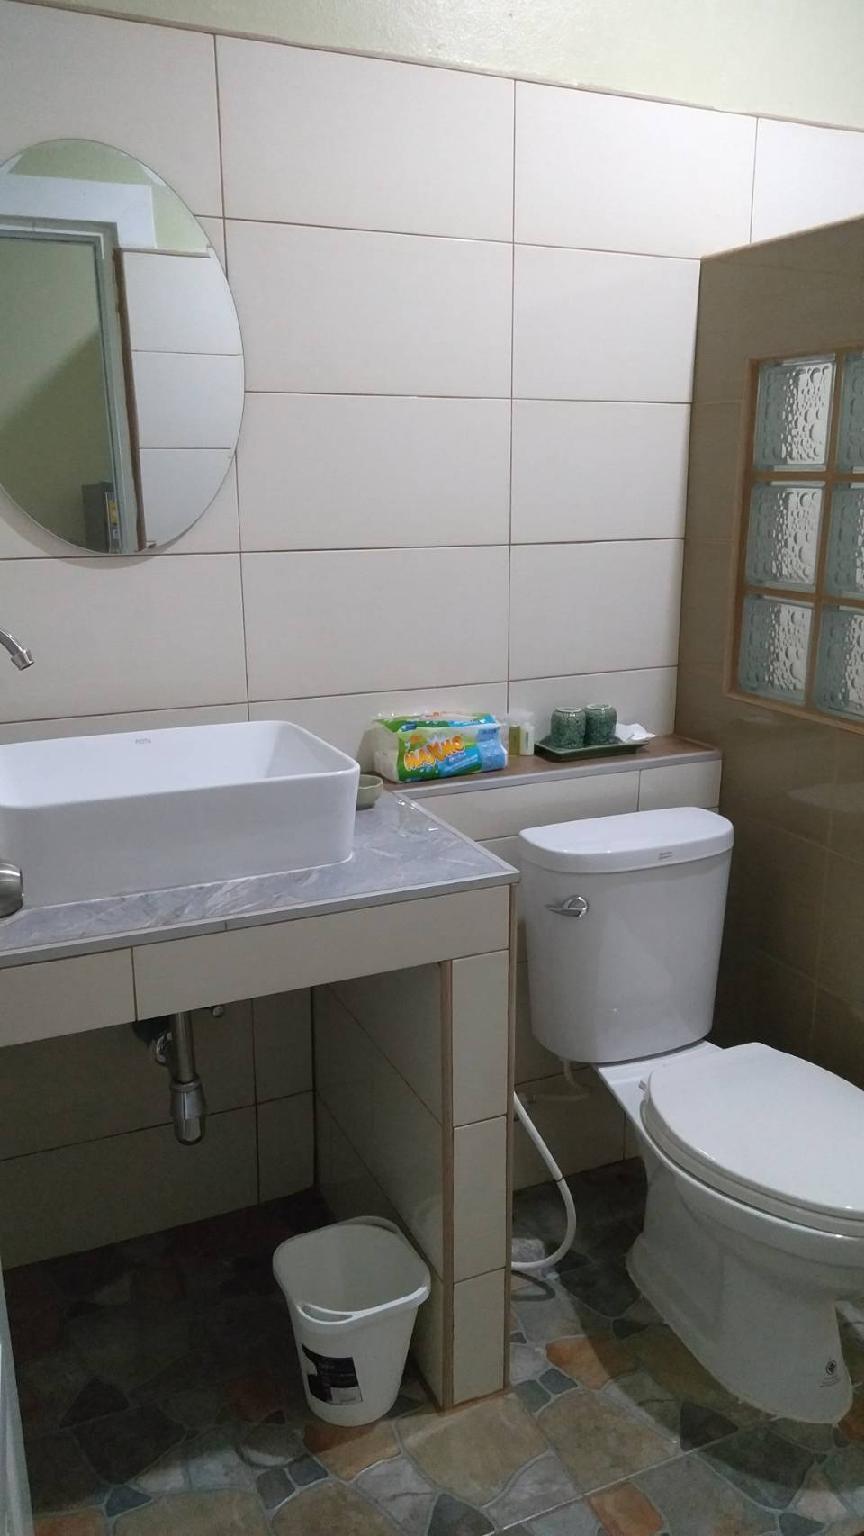 Baan Thai Lanna (Room Lanna-3) สตูดิโอ อพาร์ตเมนต์ 1 ห้องน้ำส่วนตัว ขนาด 21 ตร.ม. – ตัวเมืองลำปาง